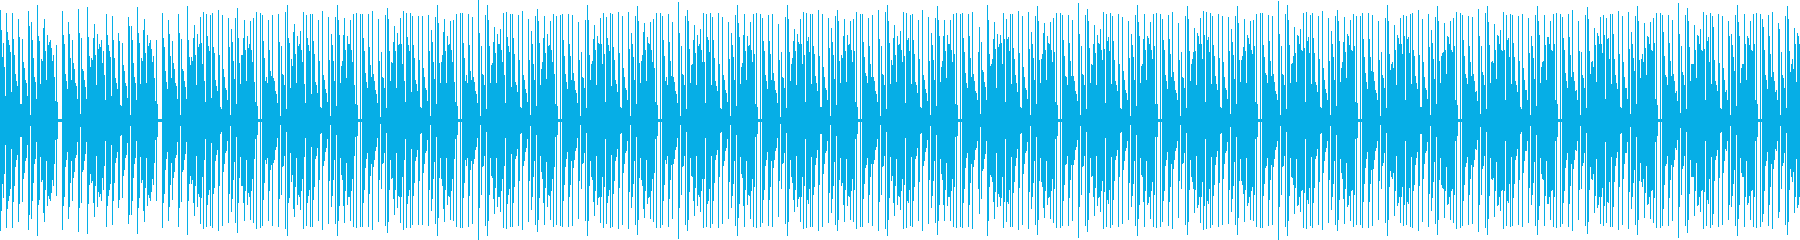 BPM95のヒップホップ風ビートの再生済みの波形